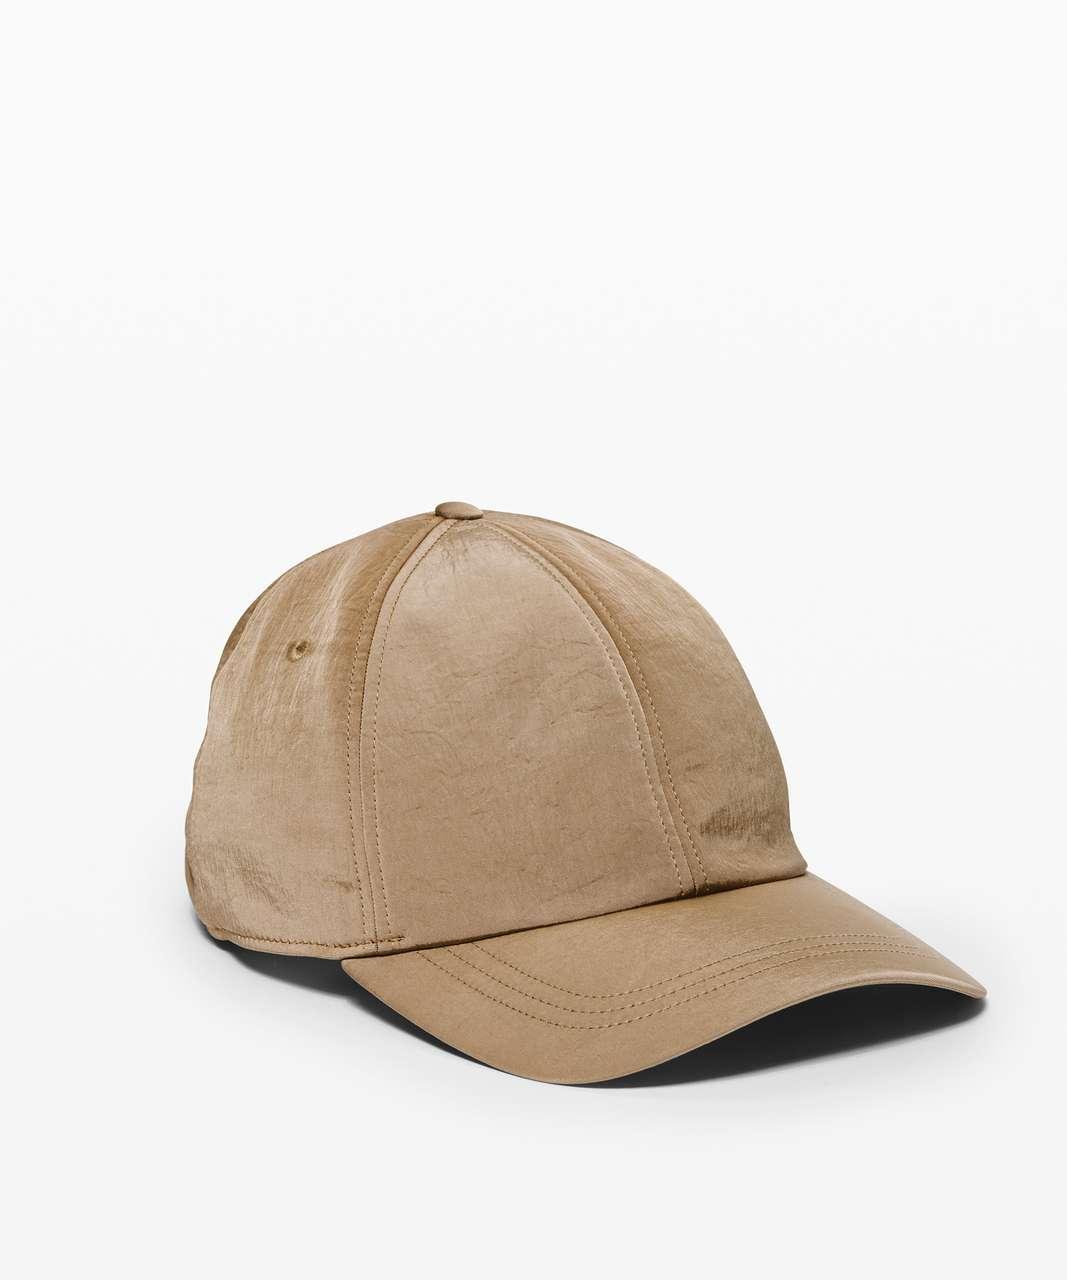 Lululemon Baller Hat II *Soft - Frontier